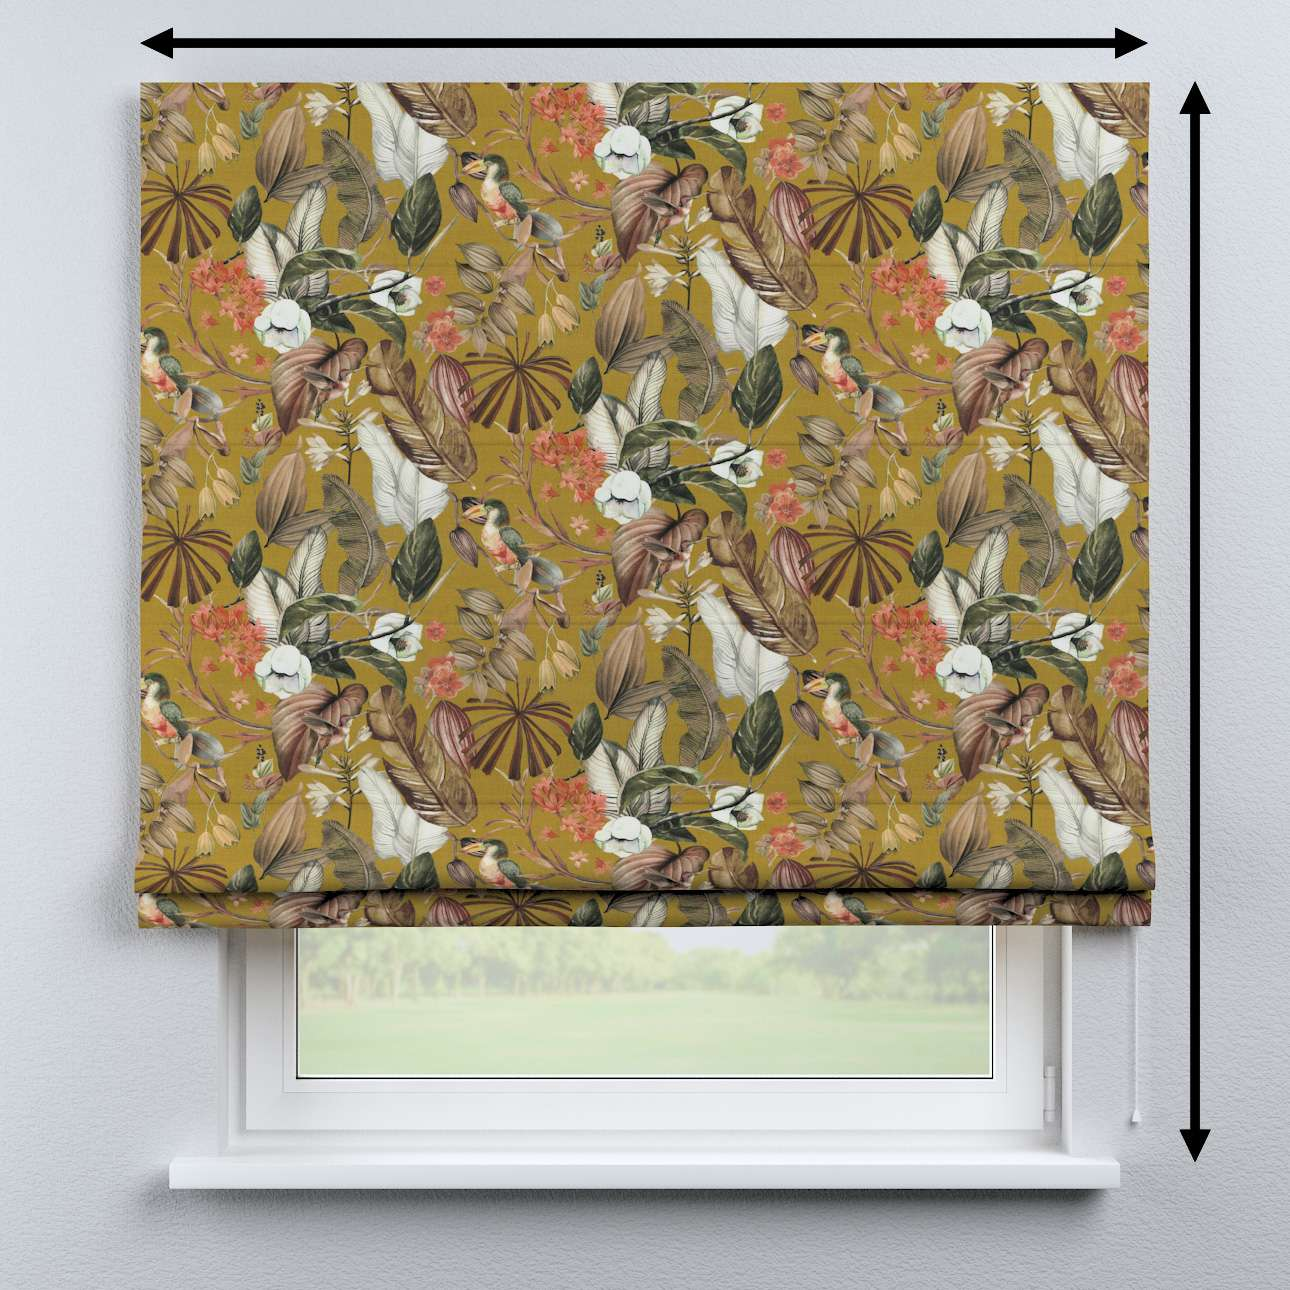 Bari roman blind in collection Abigail, fabric: 143-09